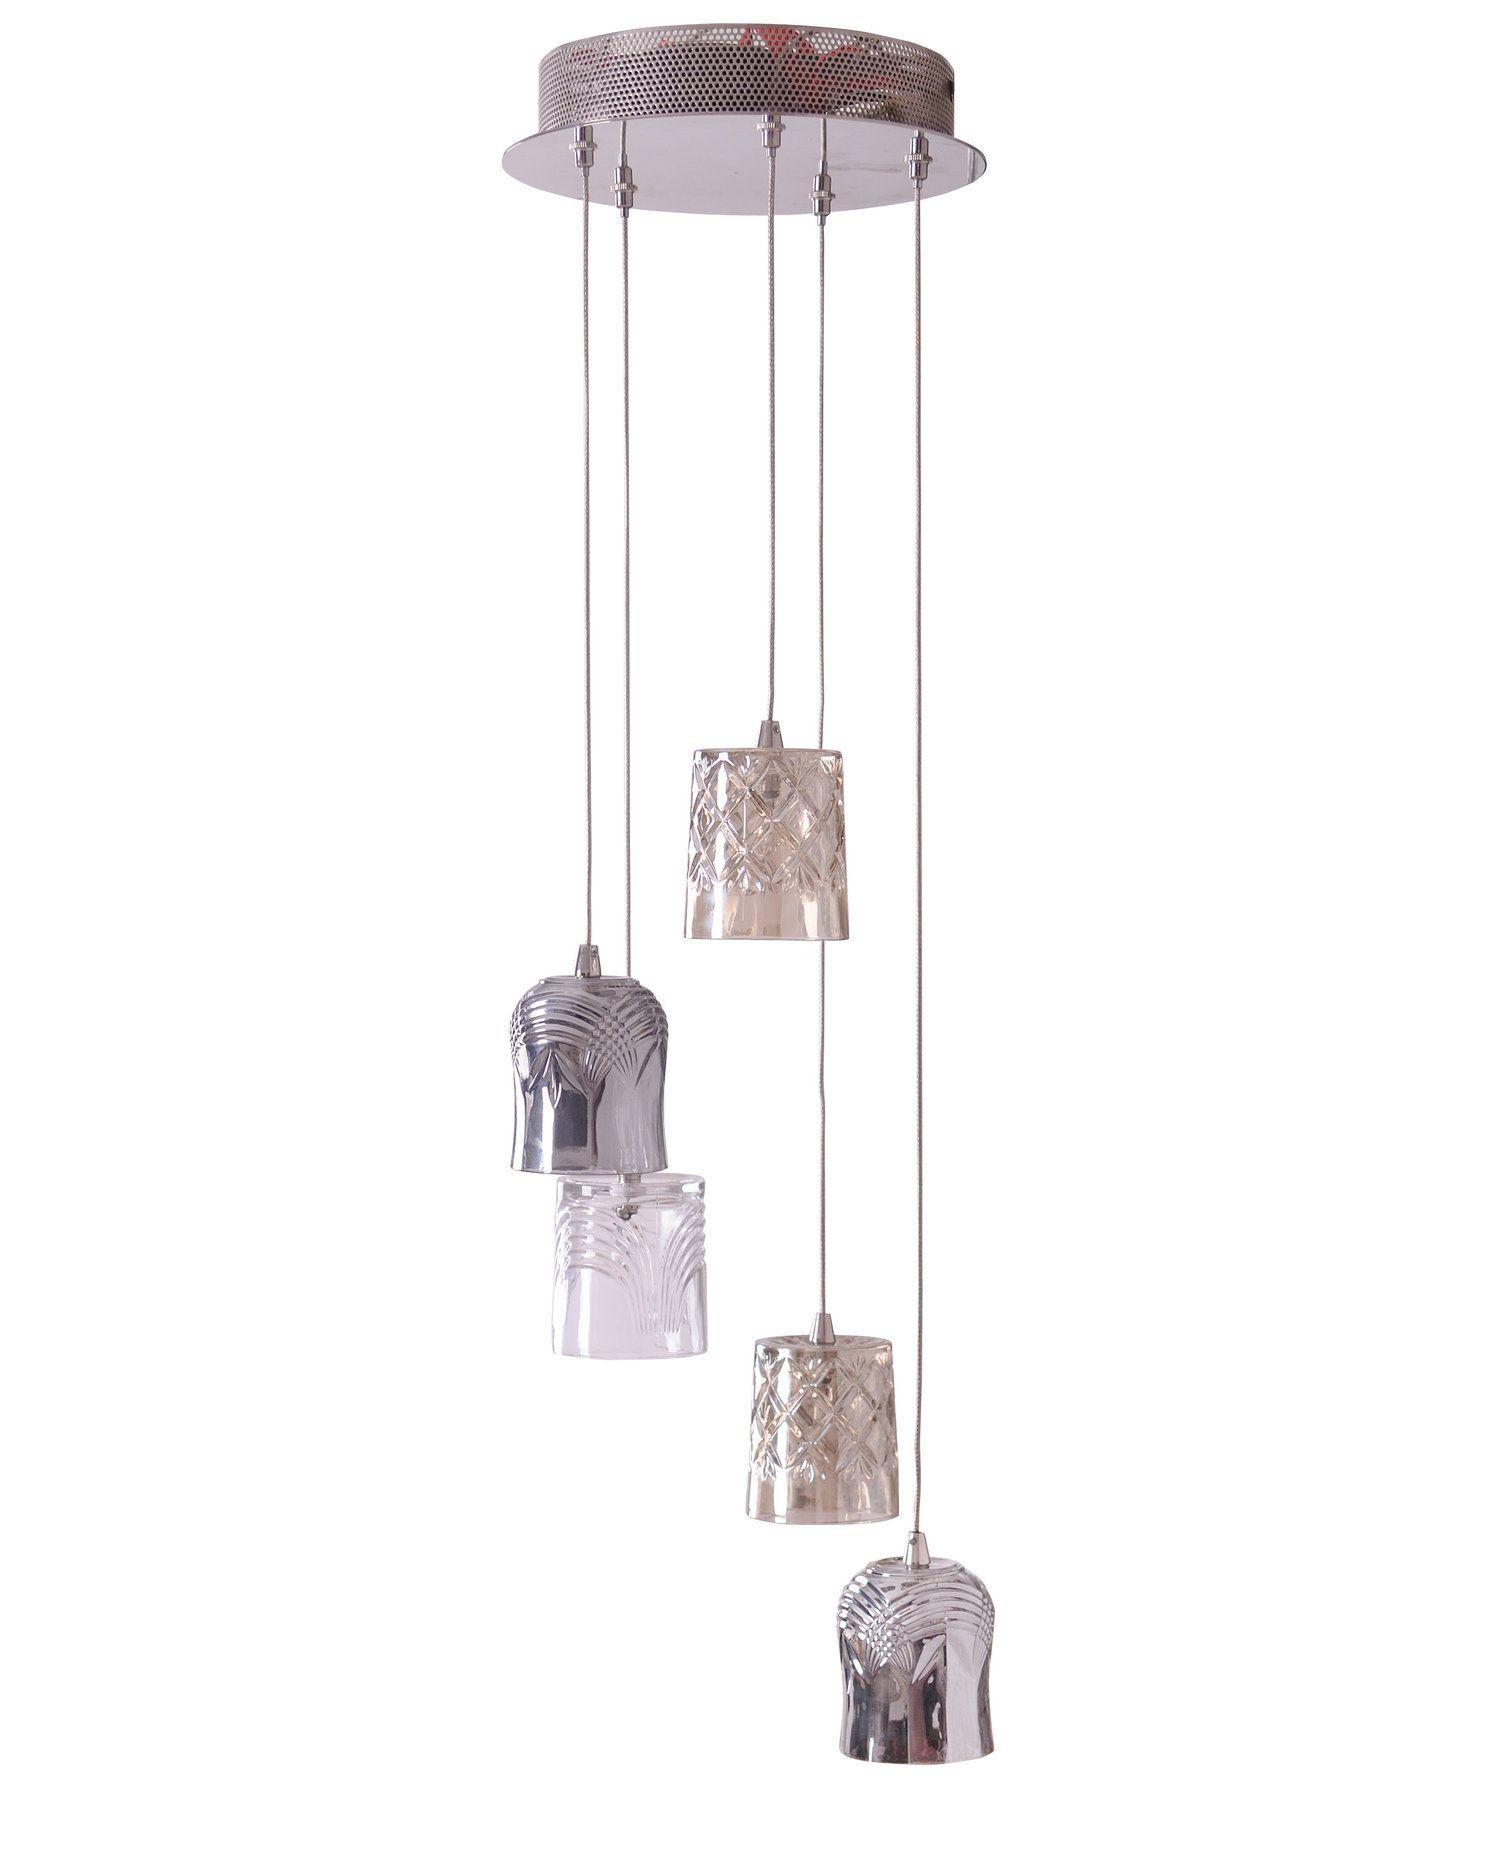 Brogo cluster nickel effect 5 lamp pendant ceiling light brogo cluster nickel effect 5 lamp pendant ceiling light departments diy at bq aloadofball Gallery